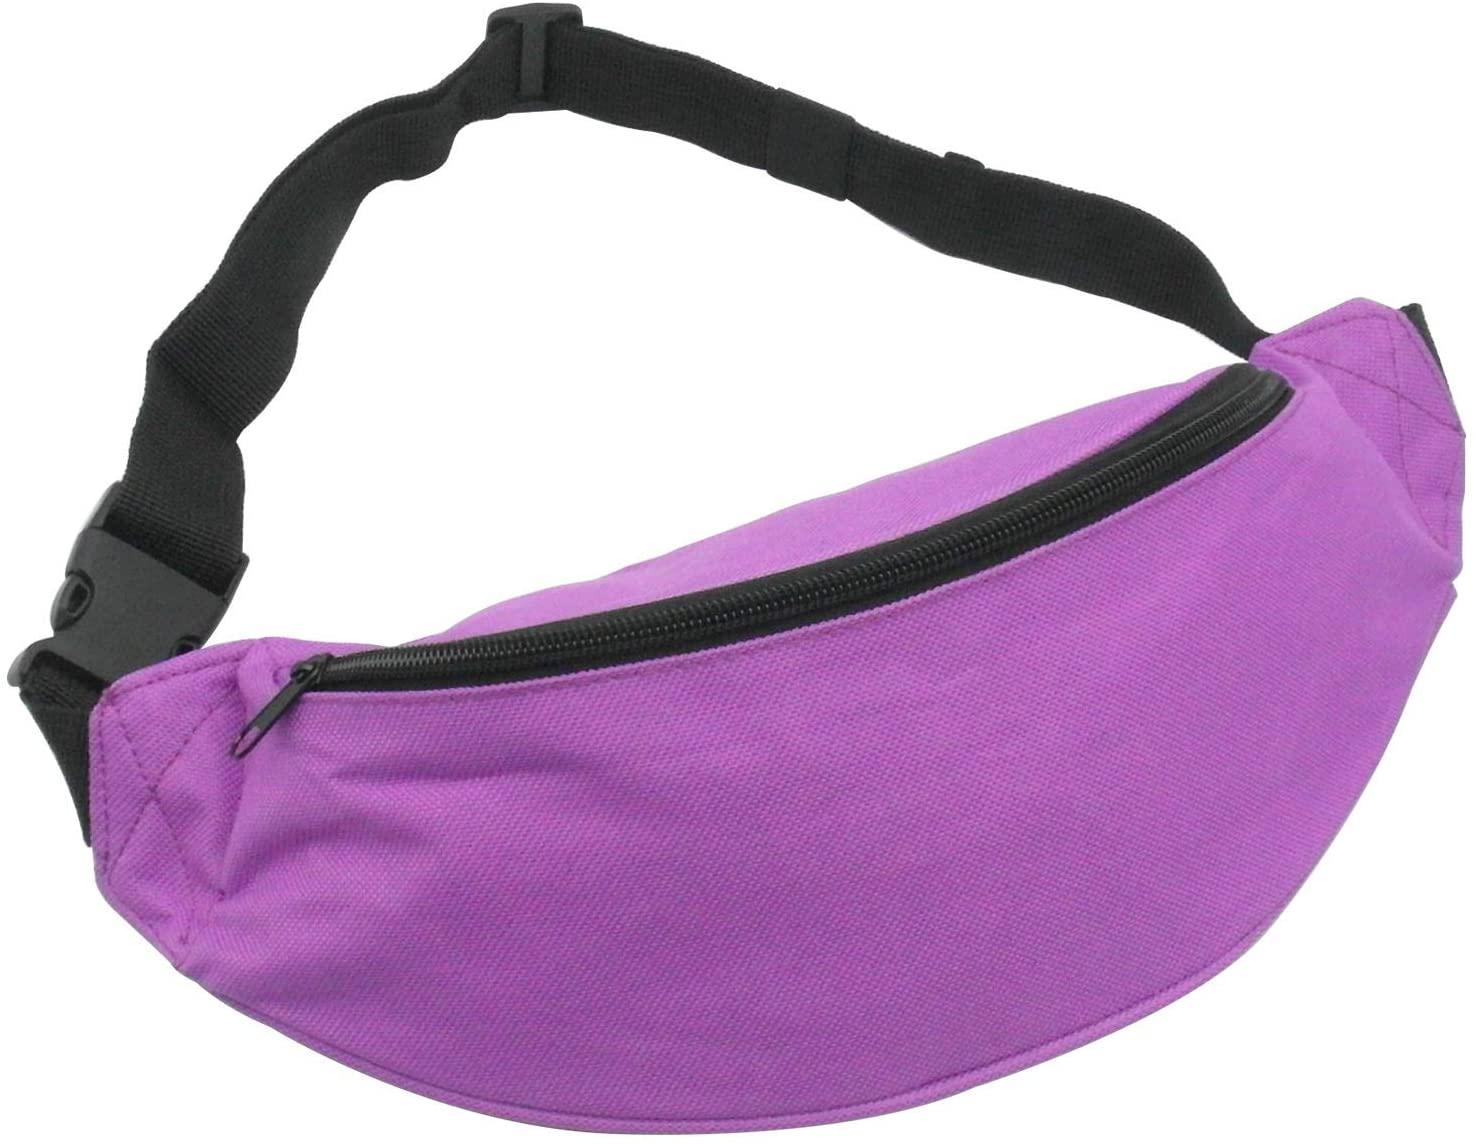 INNOLIFE Unisex Men Women Fashion Sporty Multi-Purpose 2-Zipper Waist Belt Bag Fanny Pack Adjustable Strap for Sport Hiking Traveling Passport Wallet